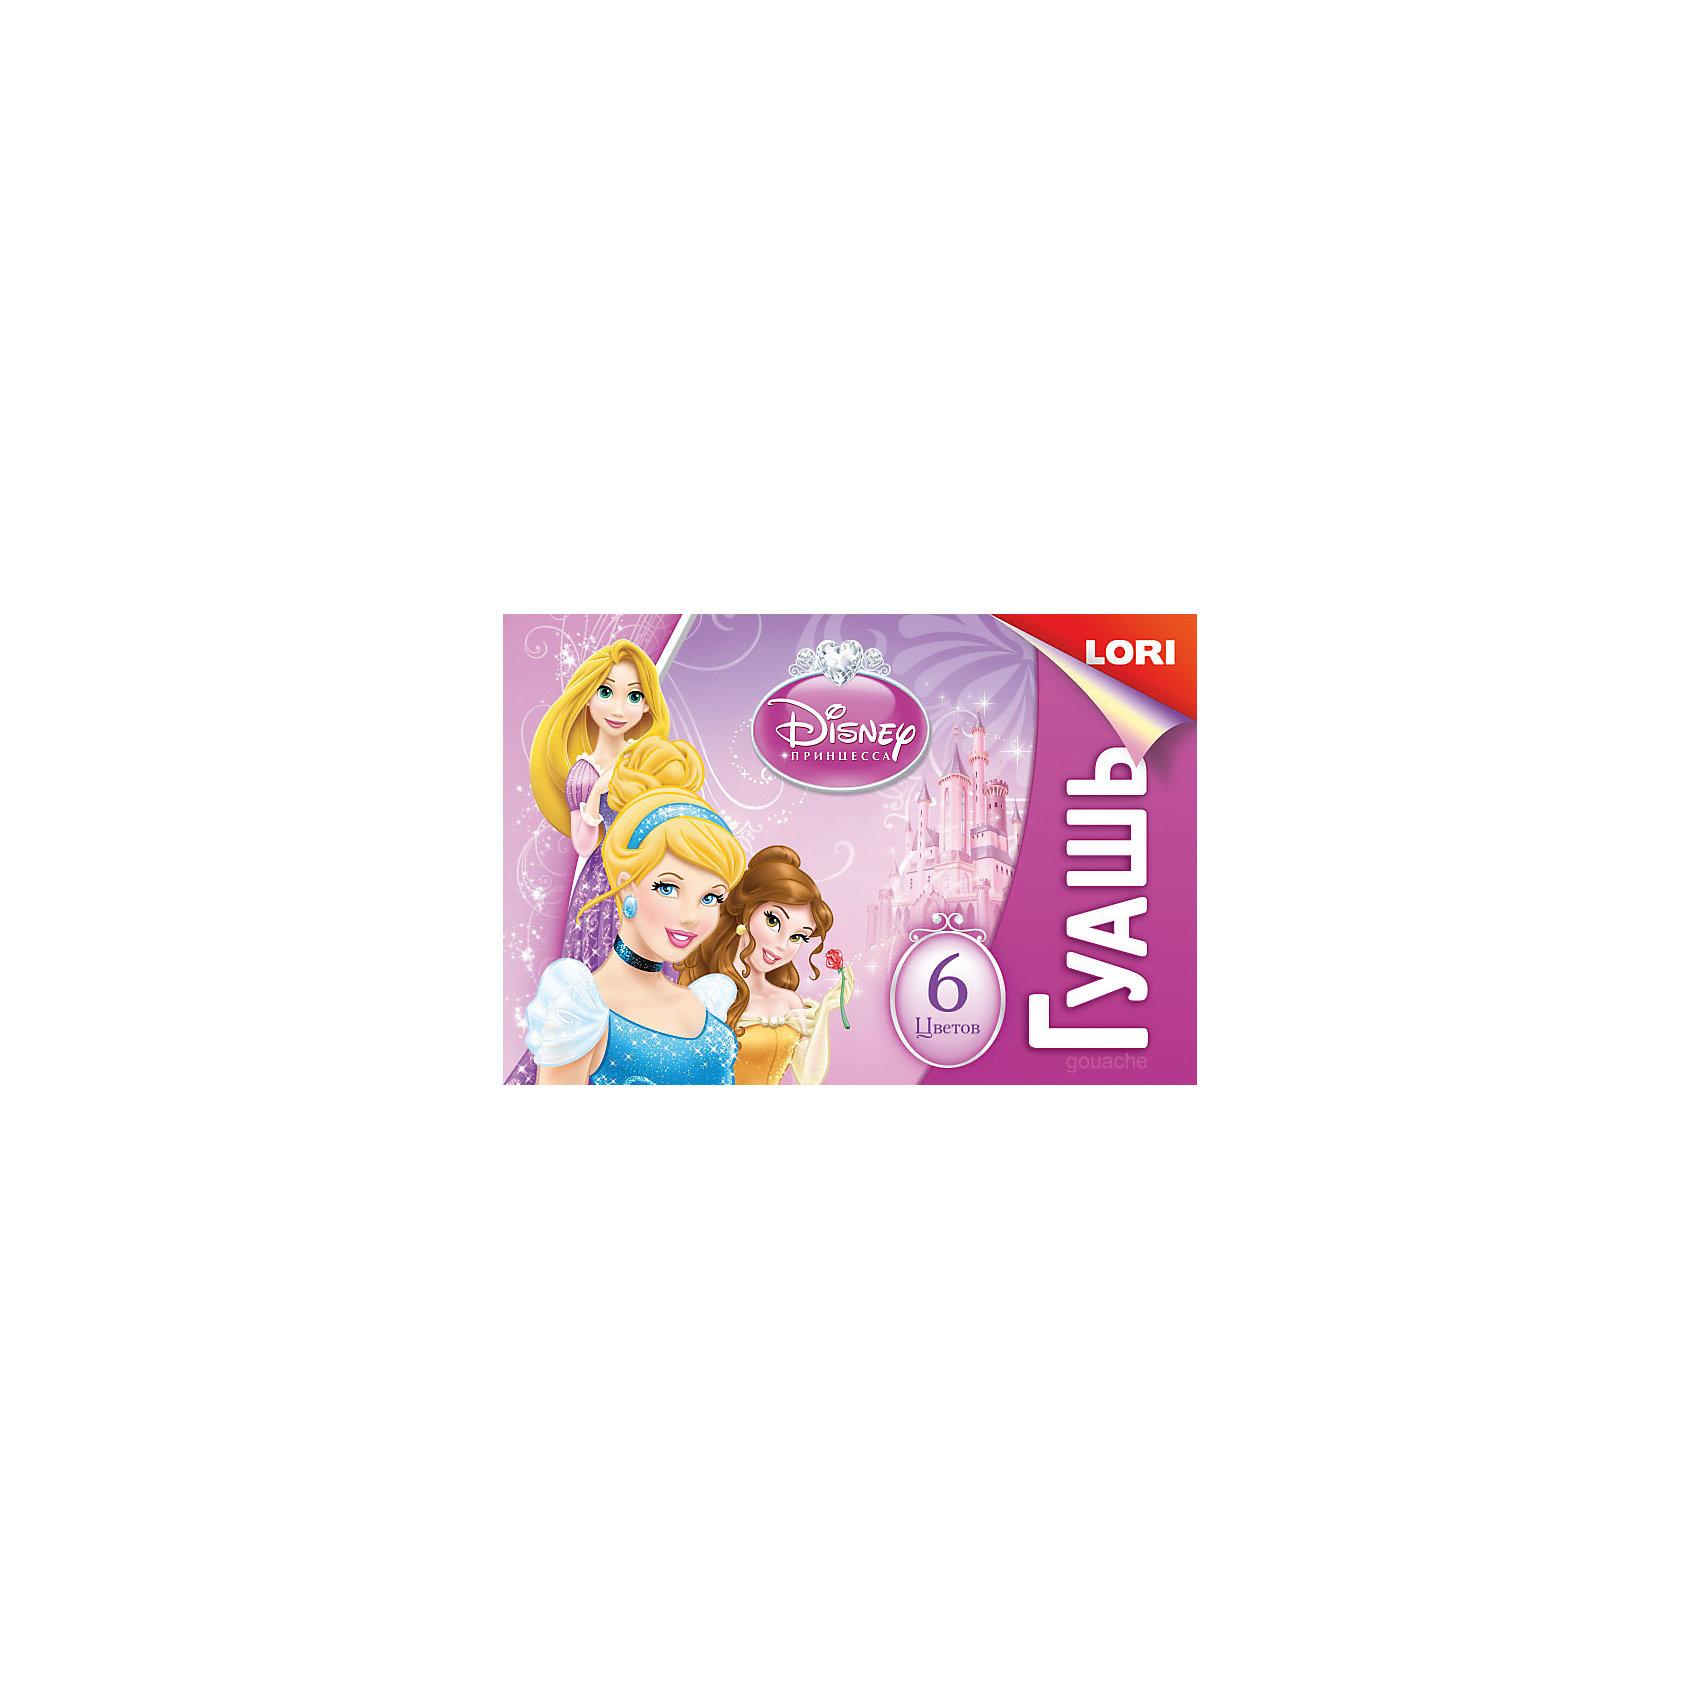 LORI Гуашь Принцессы Disney, 6 цветов пластилин lori принцессы 12 цветов